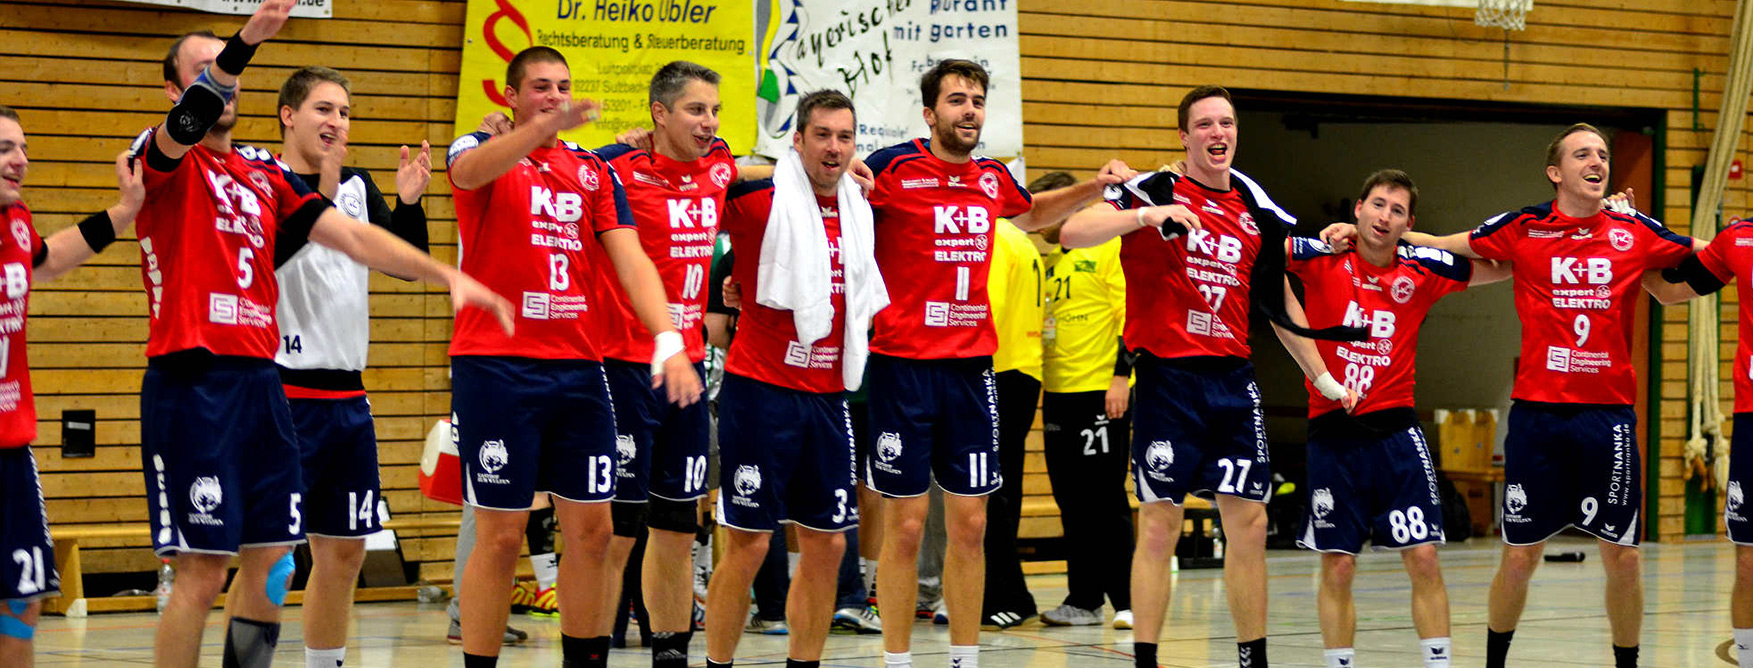 HC-Sulzbach-Handball-Bayernliga-Sieg